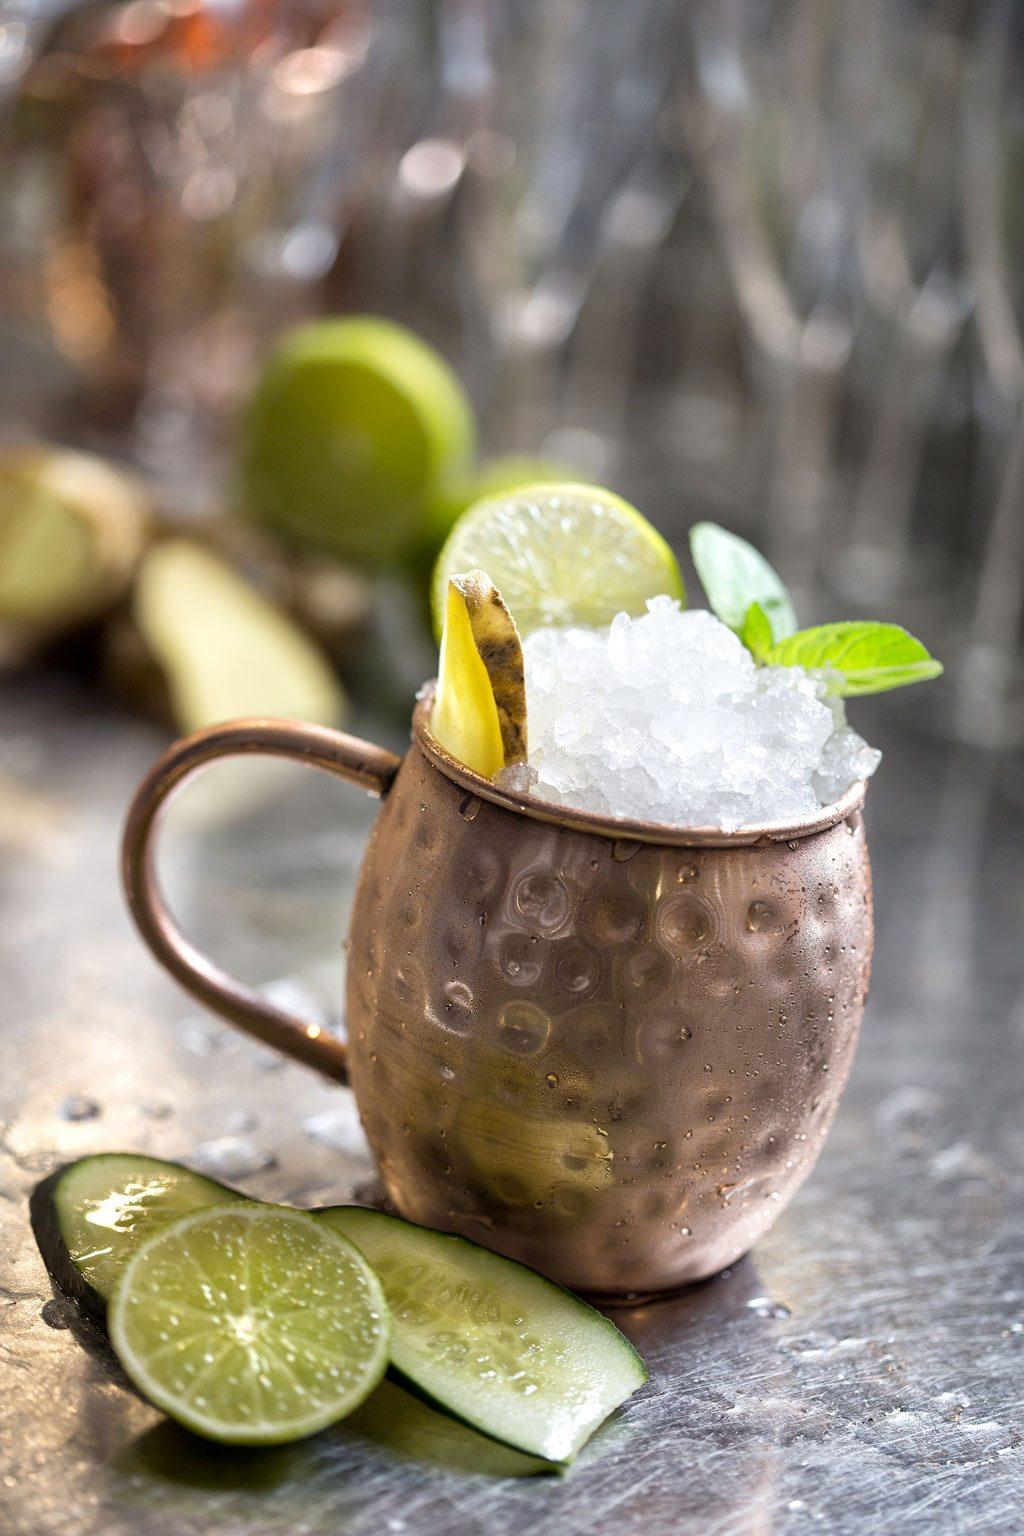 moscow mule, cocktail migliori, cocktail da lele, da lele riccione